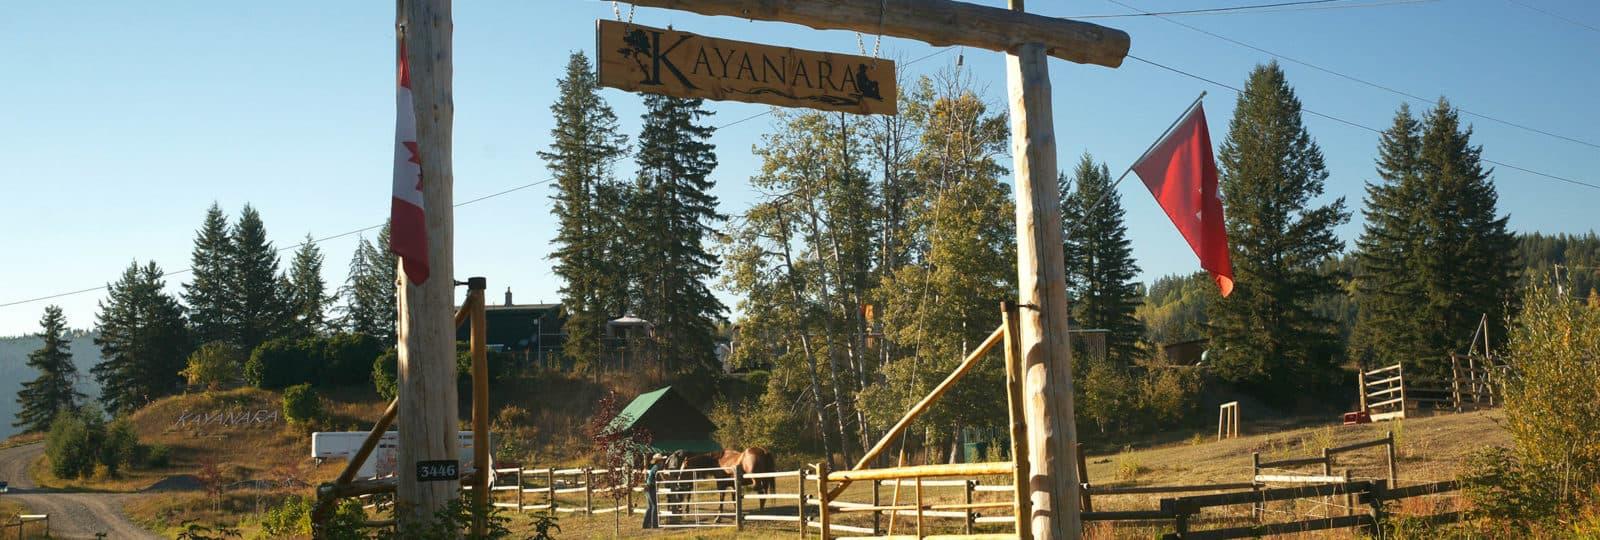 Guestranch der Pillon Familie beim Canim Lake in Westkanada